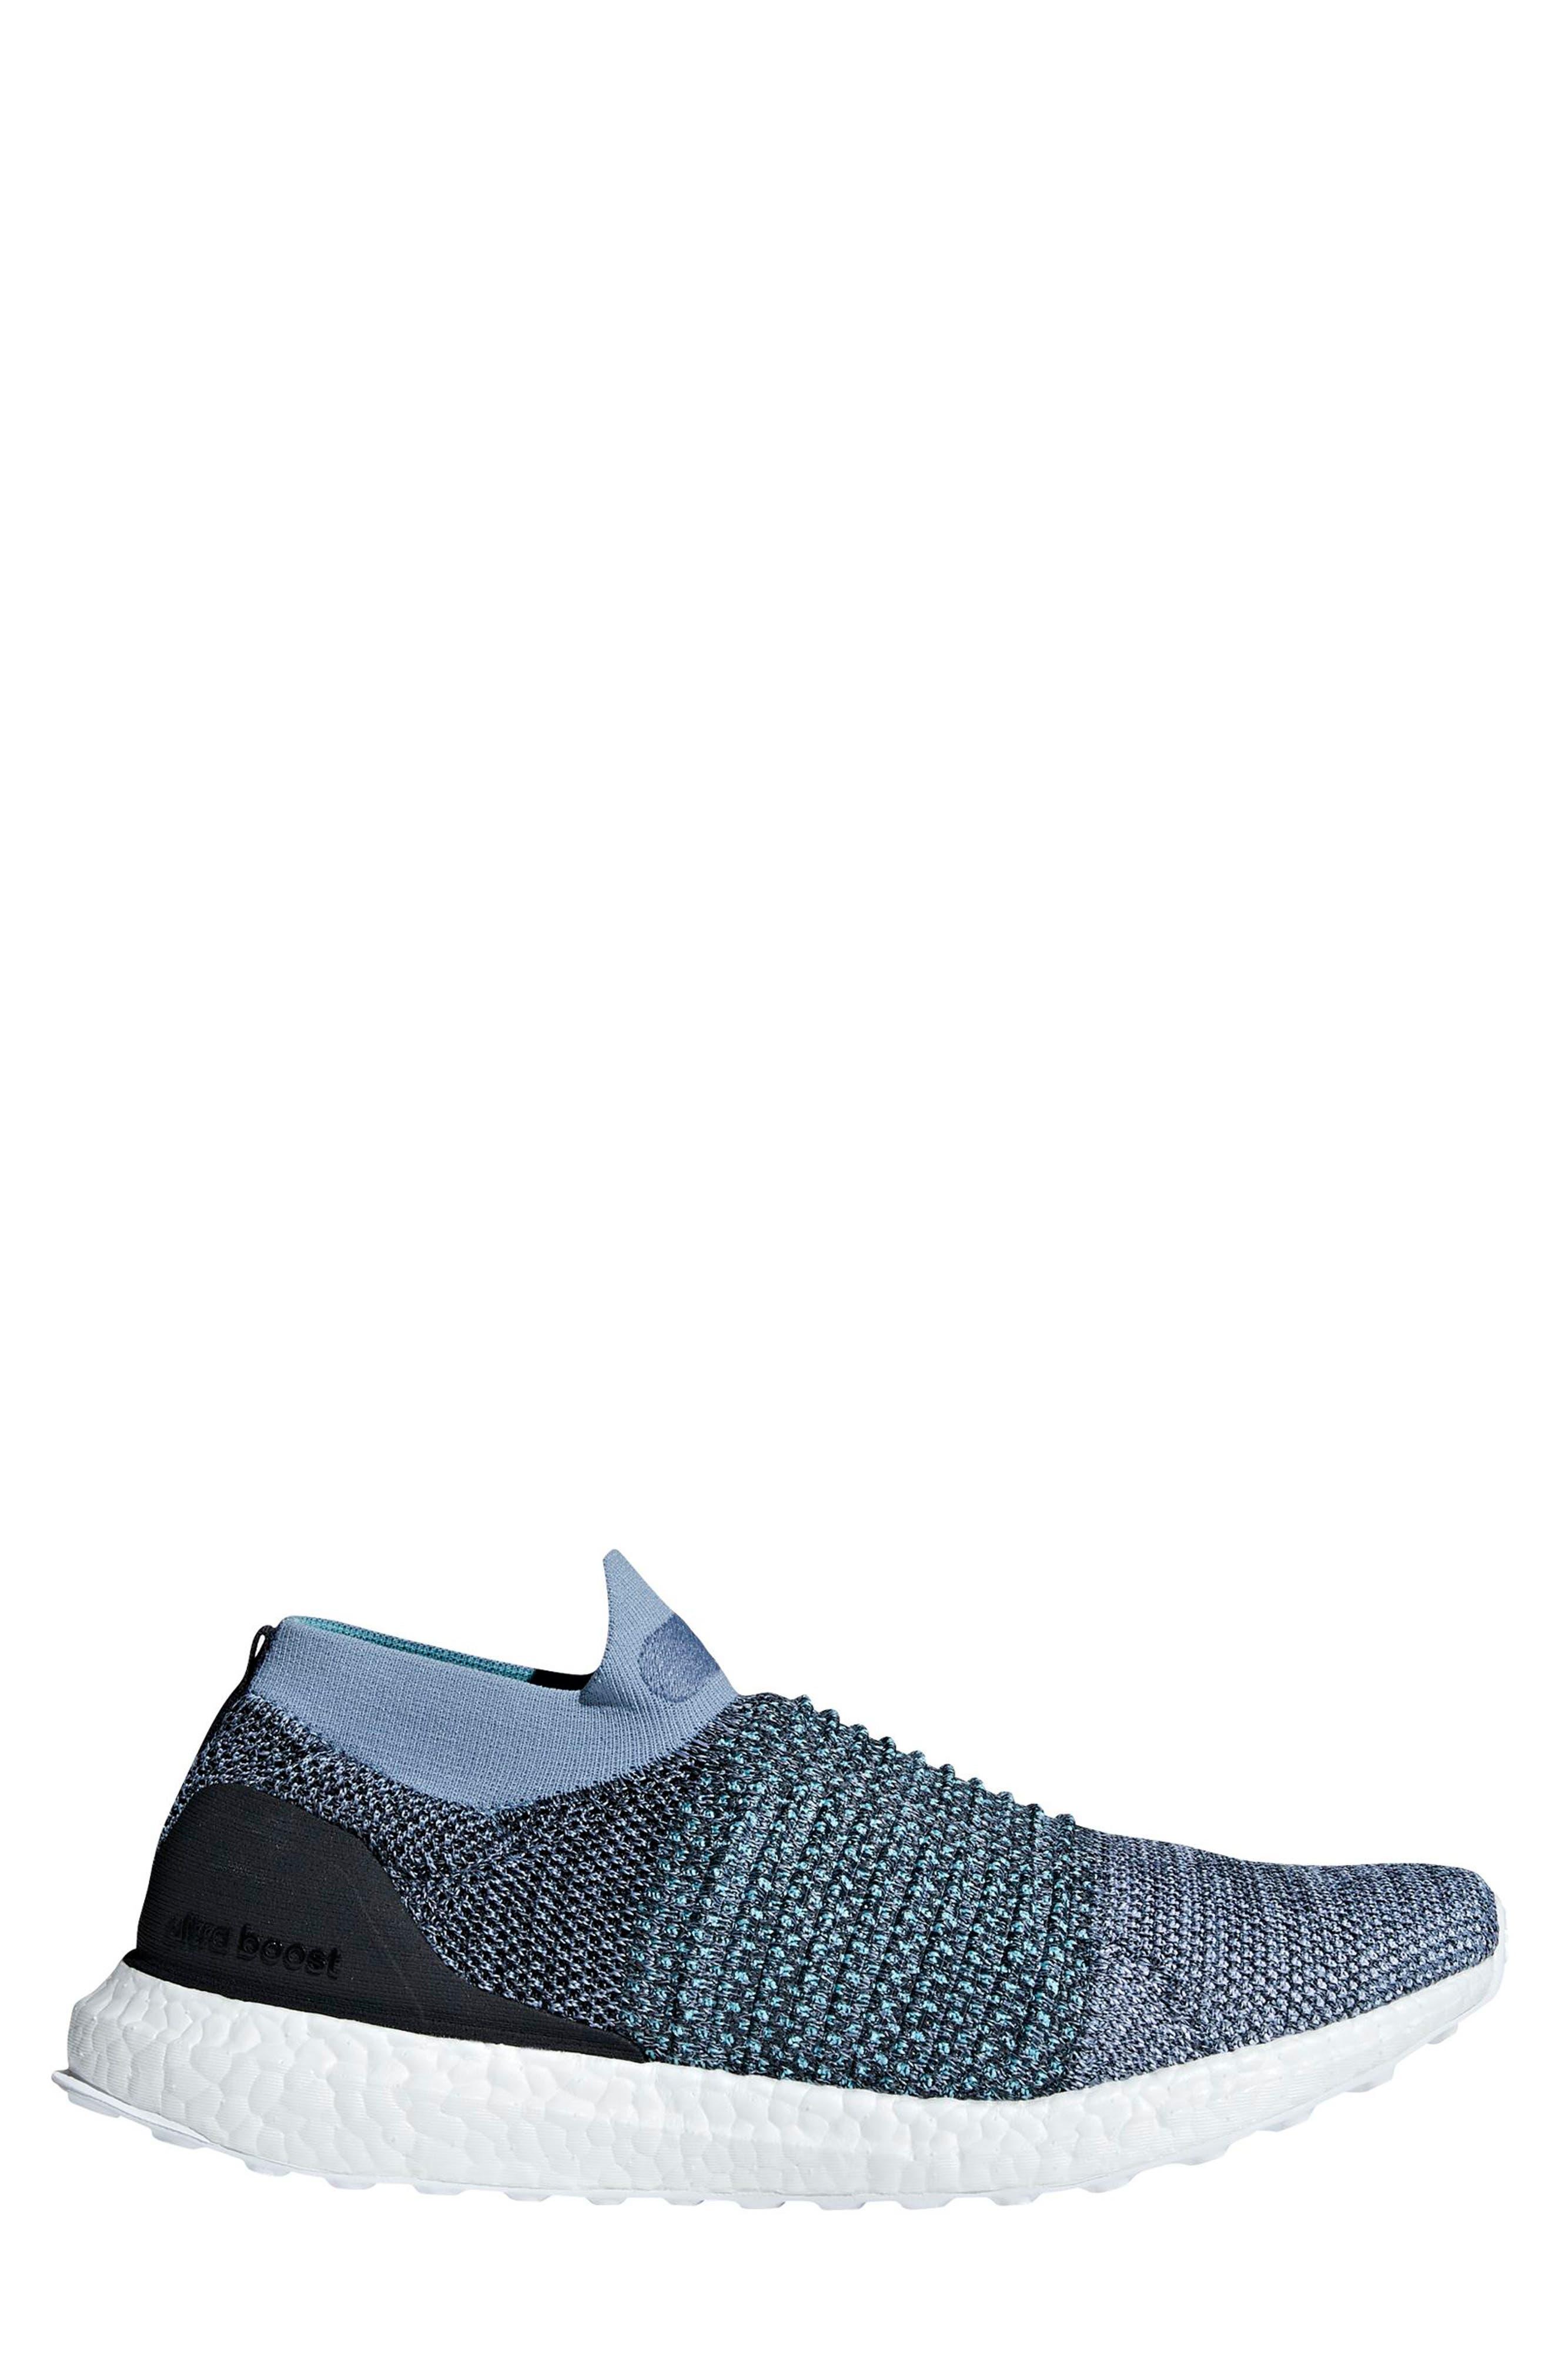 UltraBoost Laceless Running Shoe,                             Main thumbnail 1, color,                             Raw Grey/ Carbon/ Blue Spirit